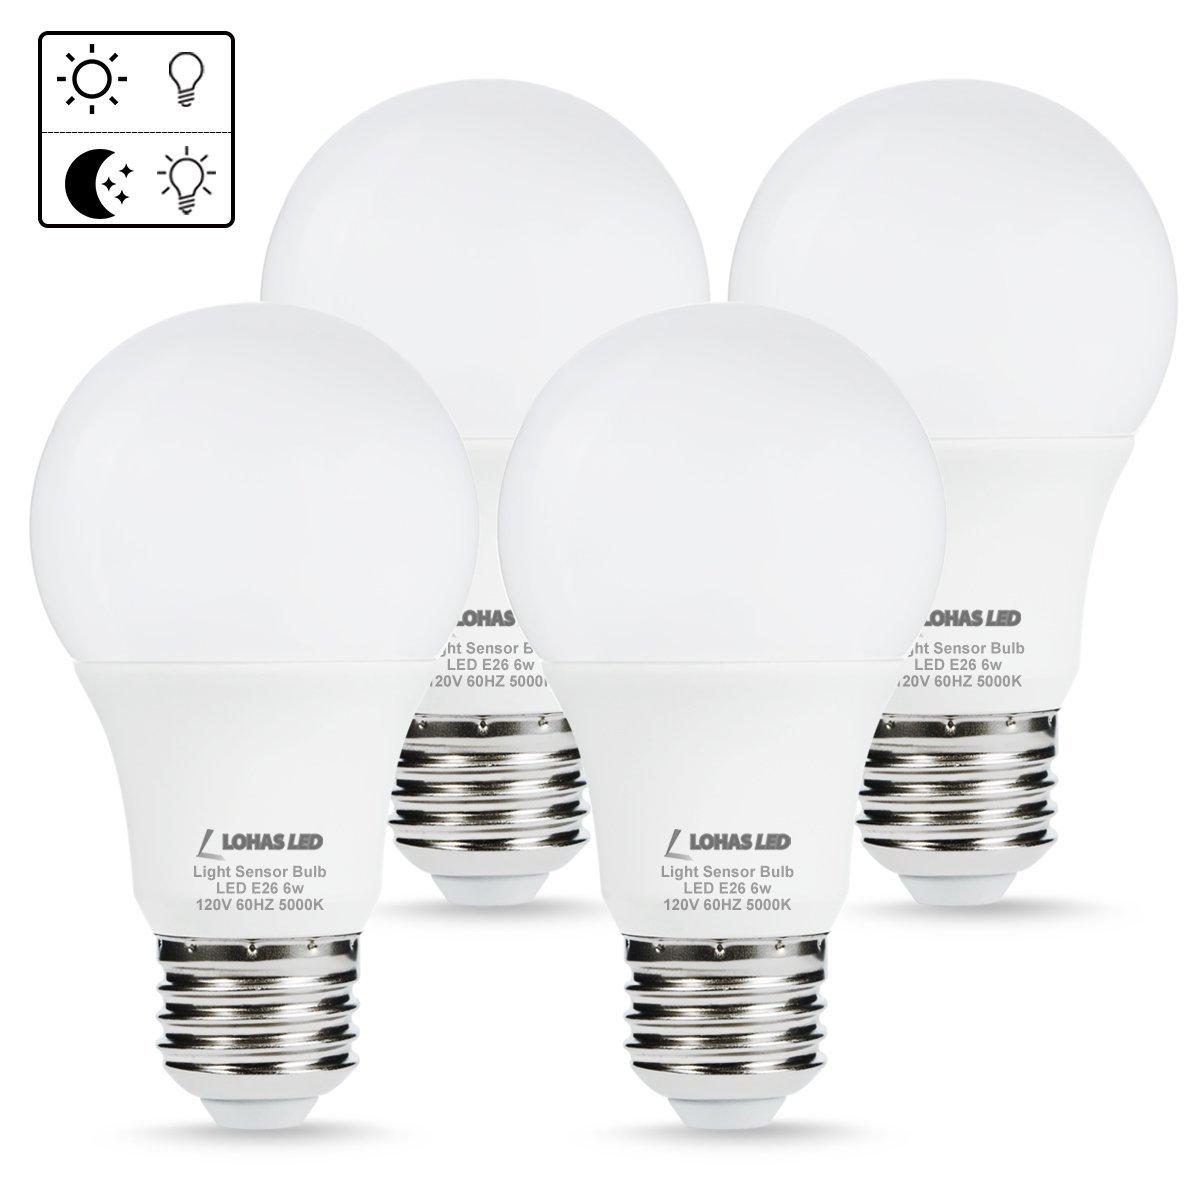 LOHAS 4-Pack A19 6W Daylight 5000K E26 LED Sensor Bulb (Auto on/off) $17.99 at Amazon